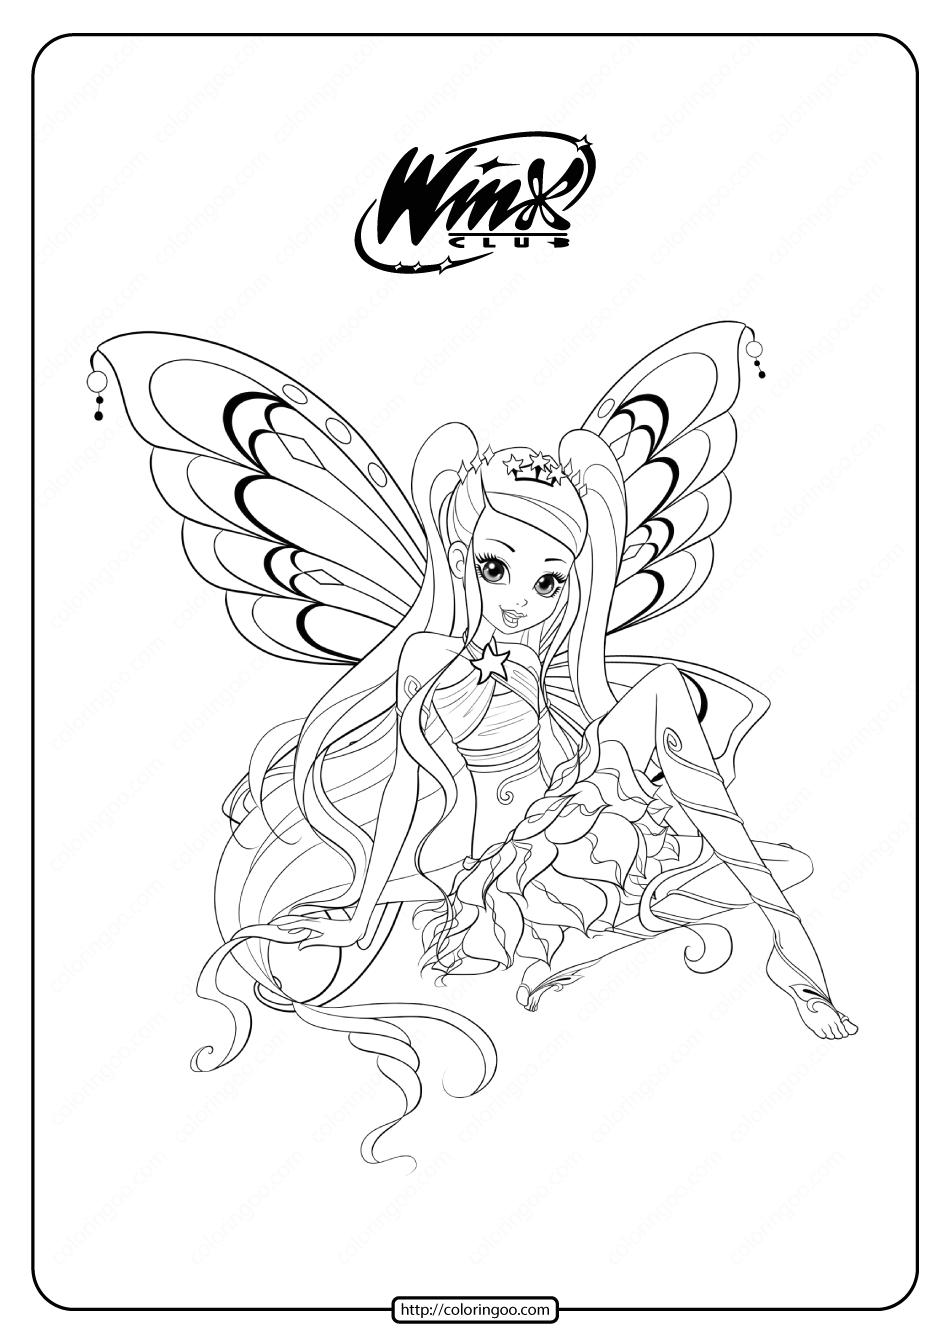 Printable Winx Cbub Enchantix Stella Coloring Pages